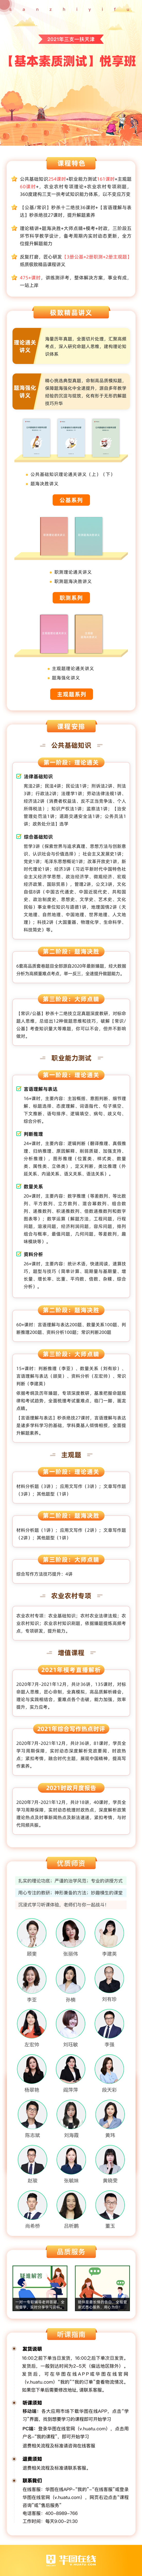 http://upload.htexam.com/userimg/1610106156.png